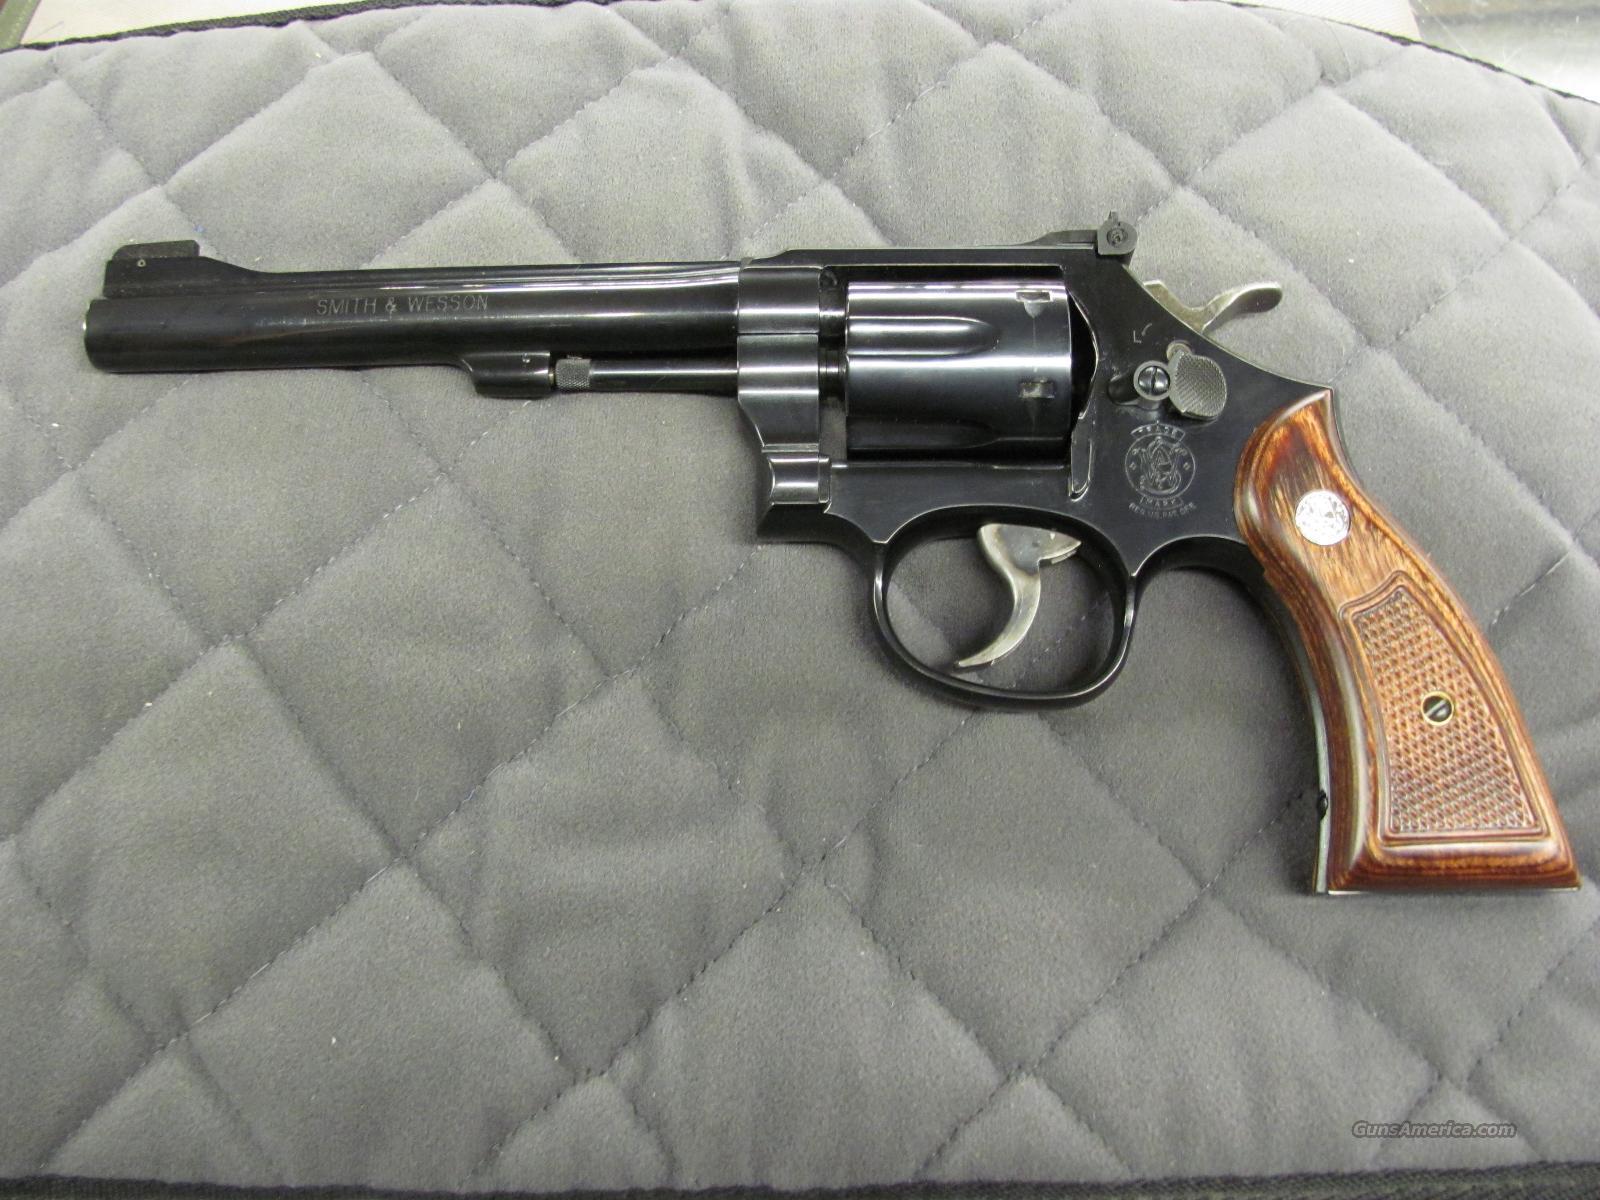 Smith & Wesson Model 17 .22 LR  NO CC FEES 150477  Guns > Pistols > Smith & Wesson Revolvers > Full Frame Revolver